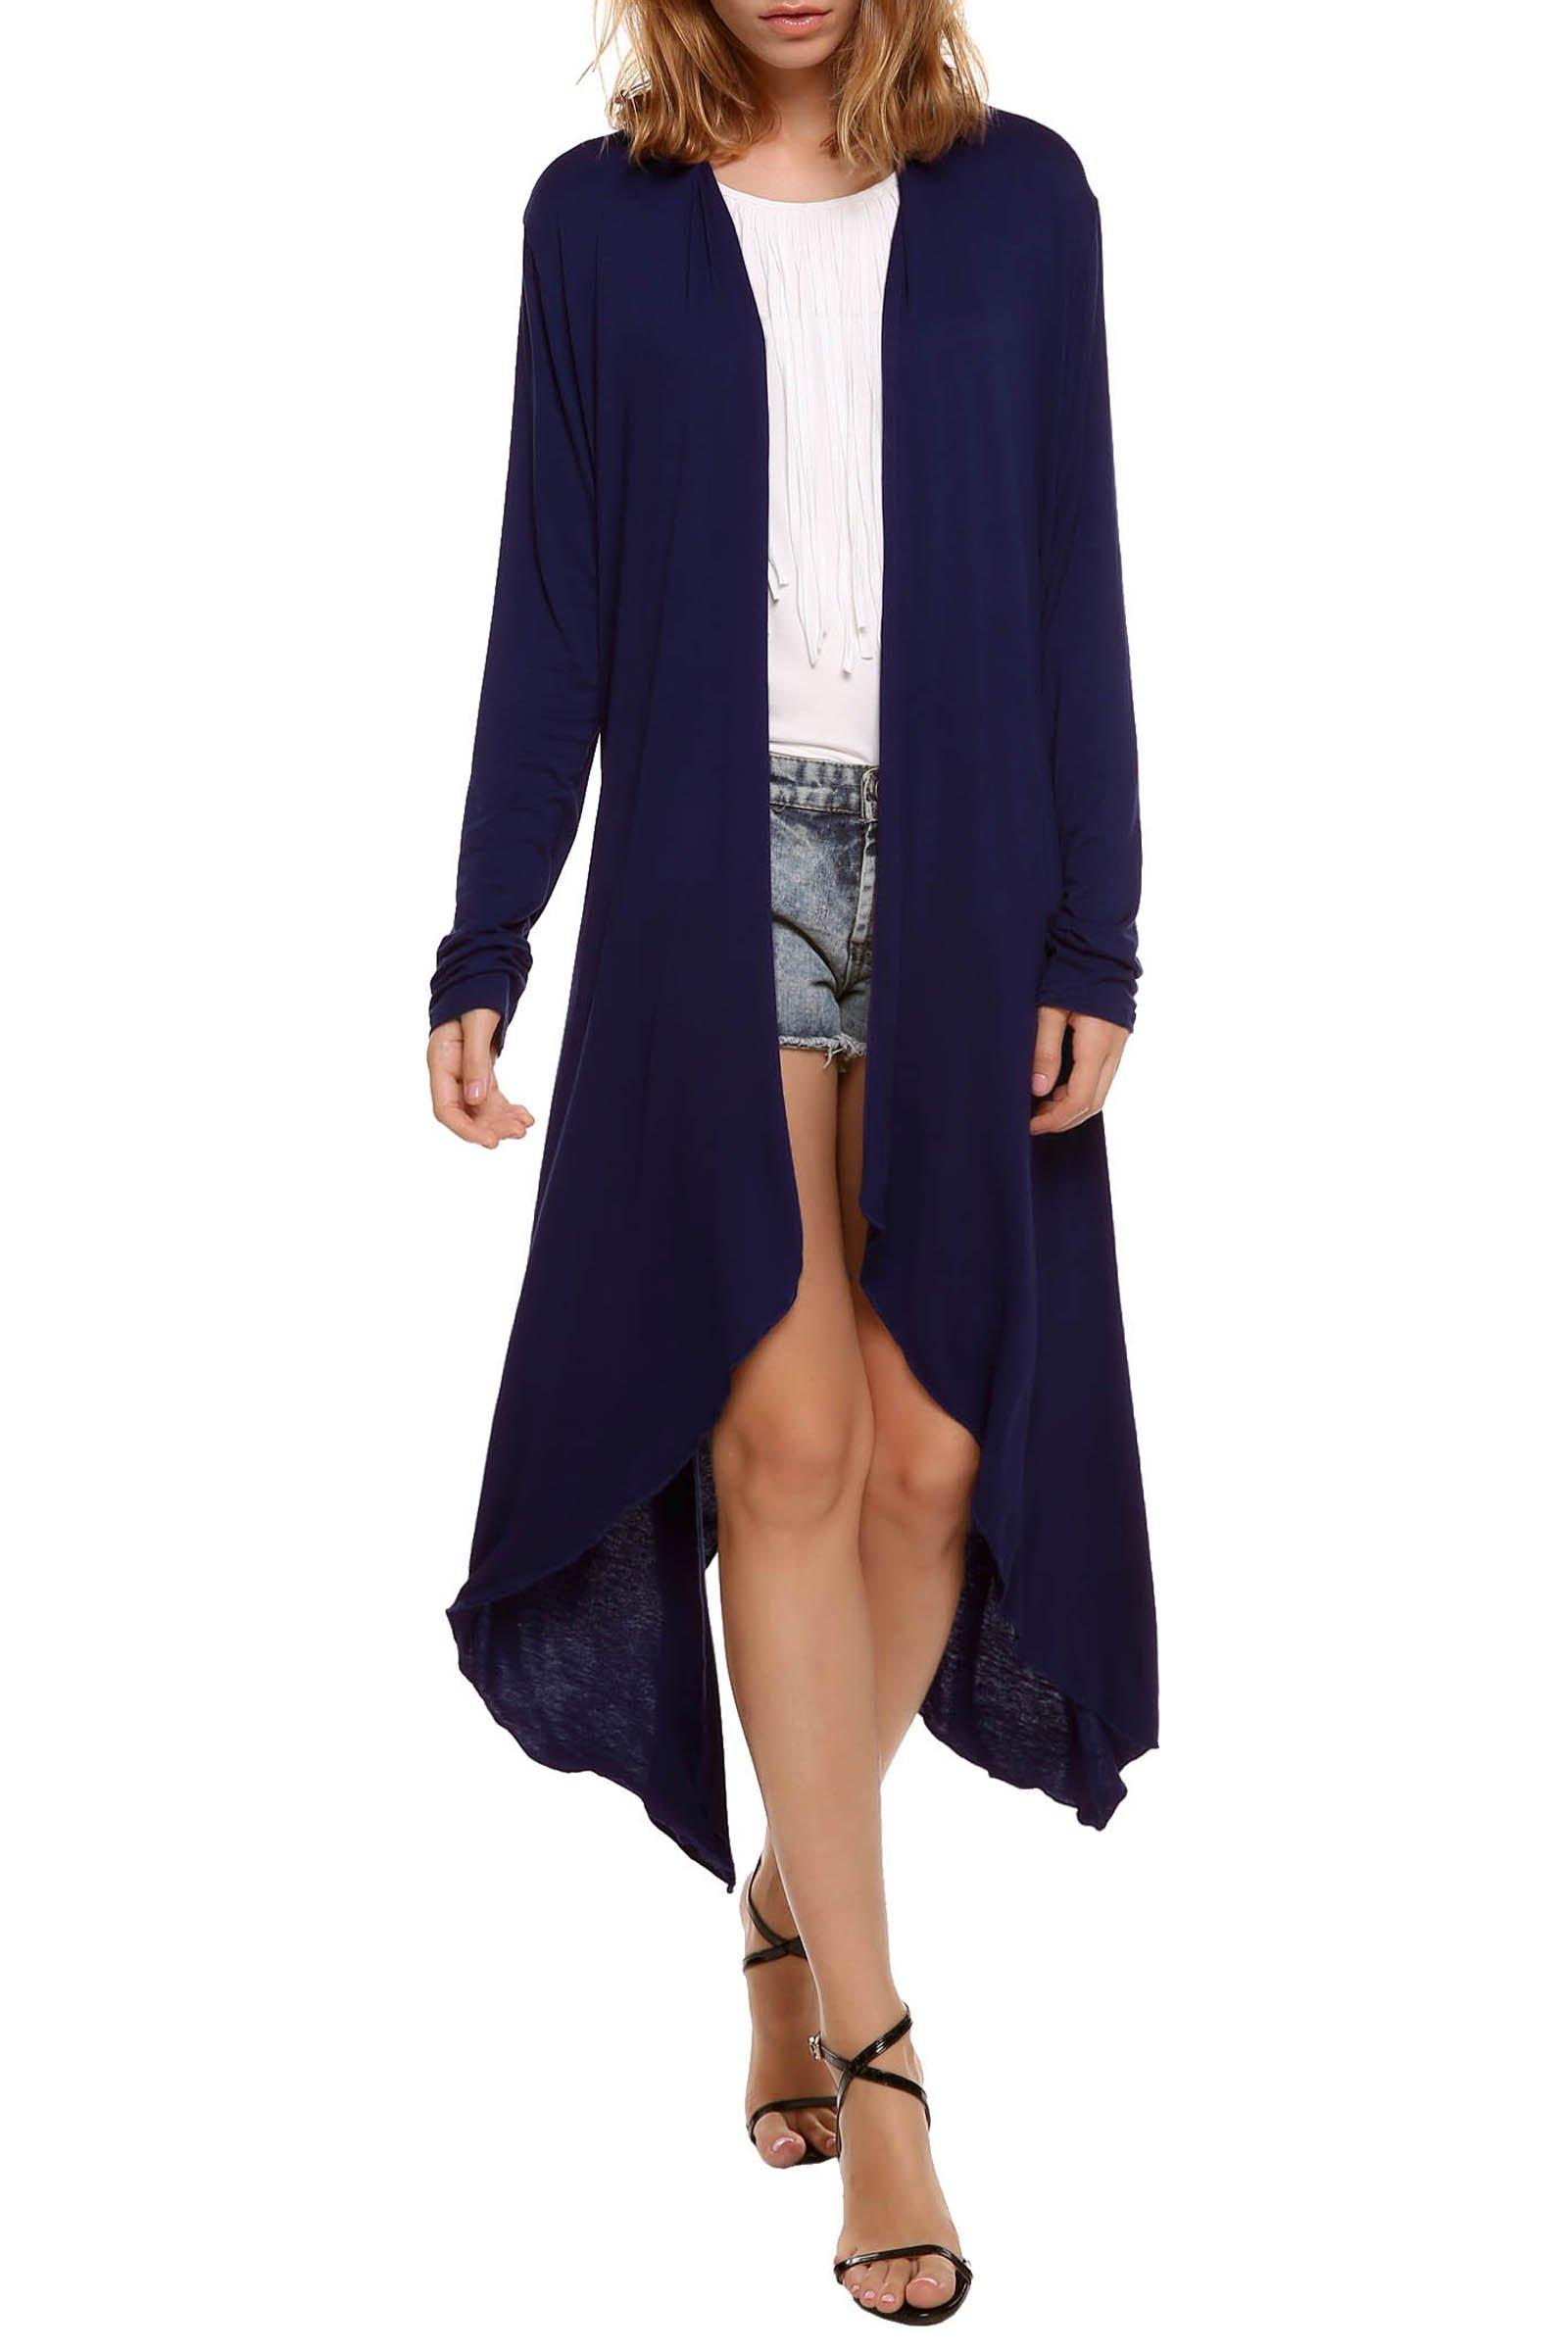 Beyove Women's Long Sleeve Asymmetric Hem Open Front Draped Cardigan Sweater Navy Blue M